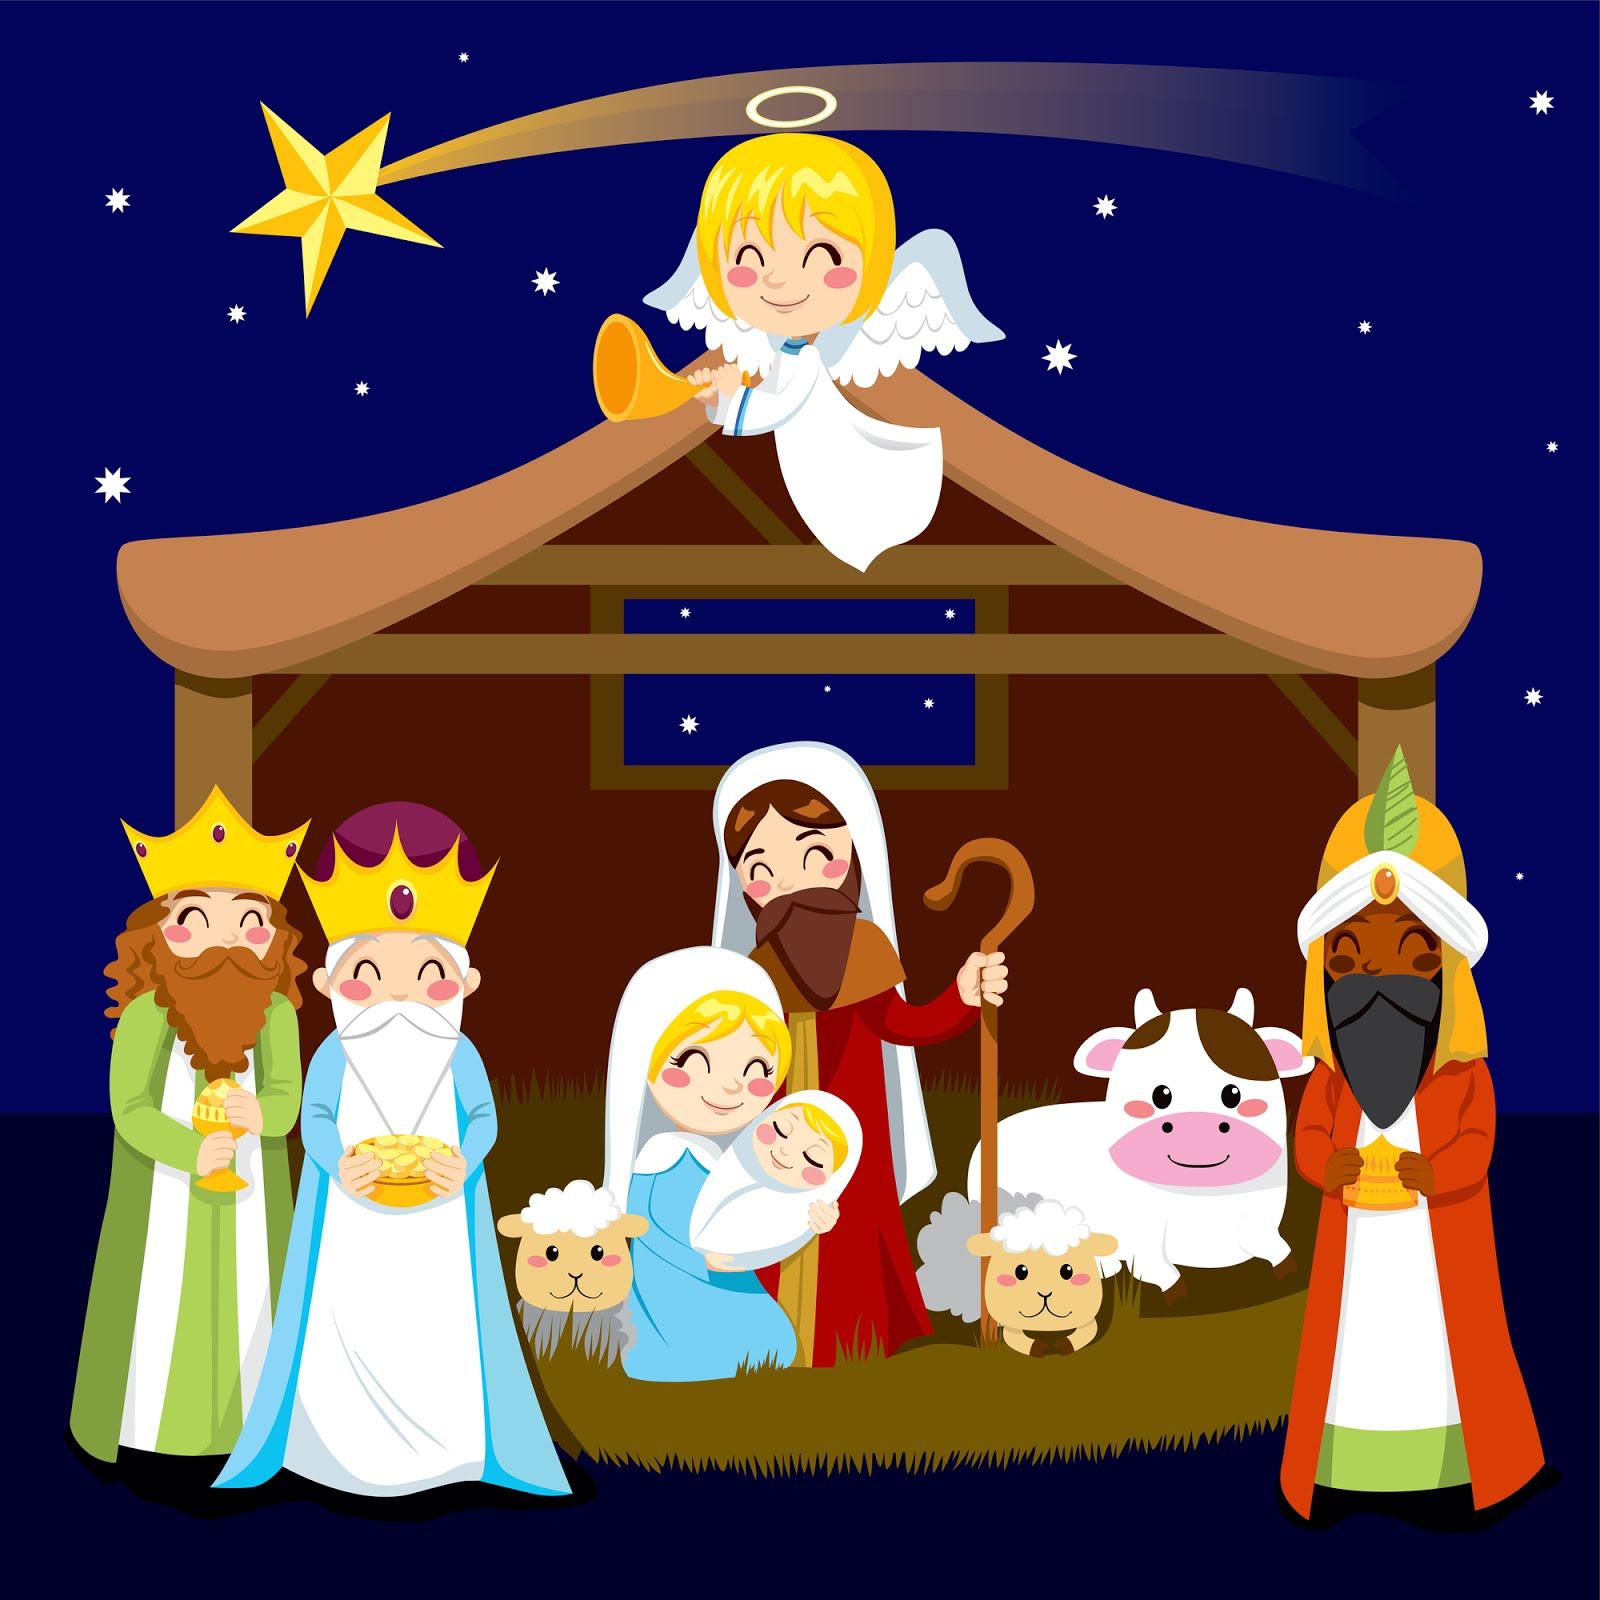 http://4.bp.blogspot.com/-oh6xVb1GBUA/UOjrYuZrKGI/AAAAAAABdHE/3o_ehw9M7Ds/s1600/imagenes-del-dia-de-reyes-6-de-enero-the-wise-man-magi-6.jpg